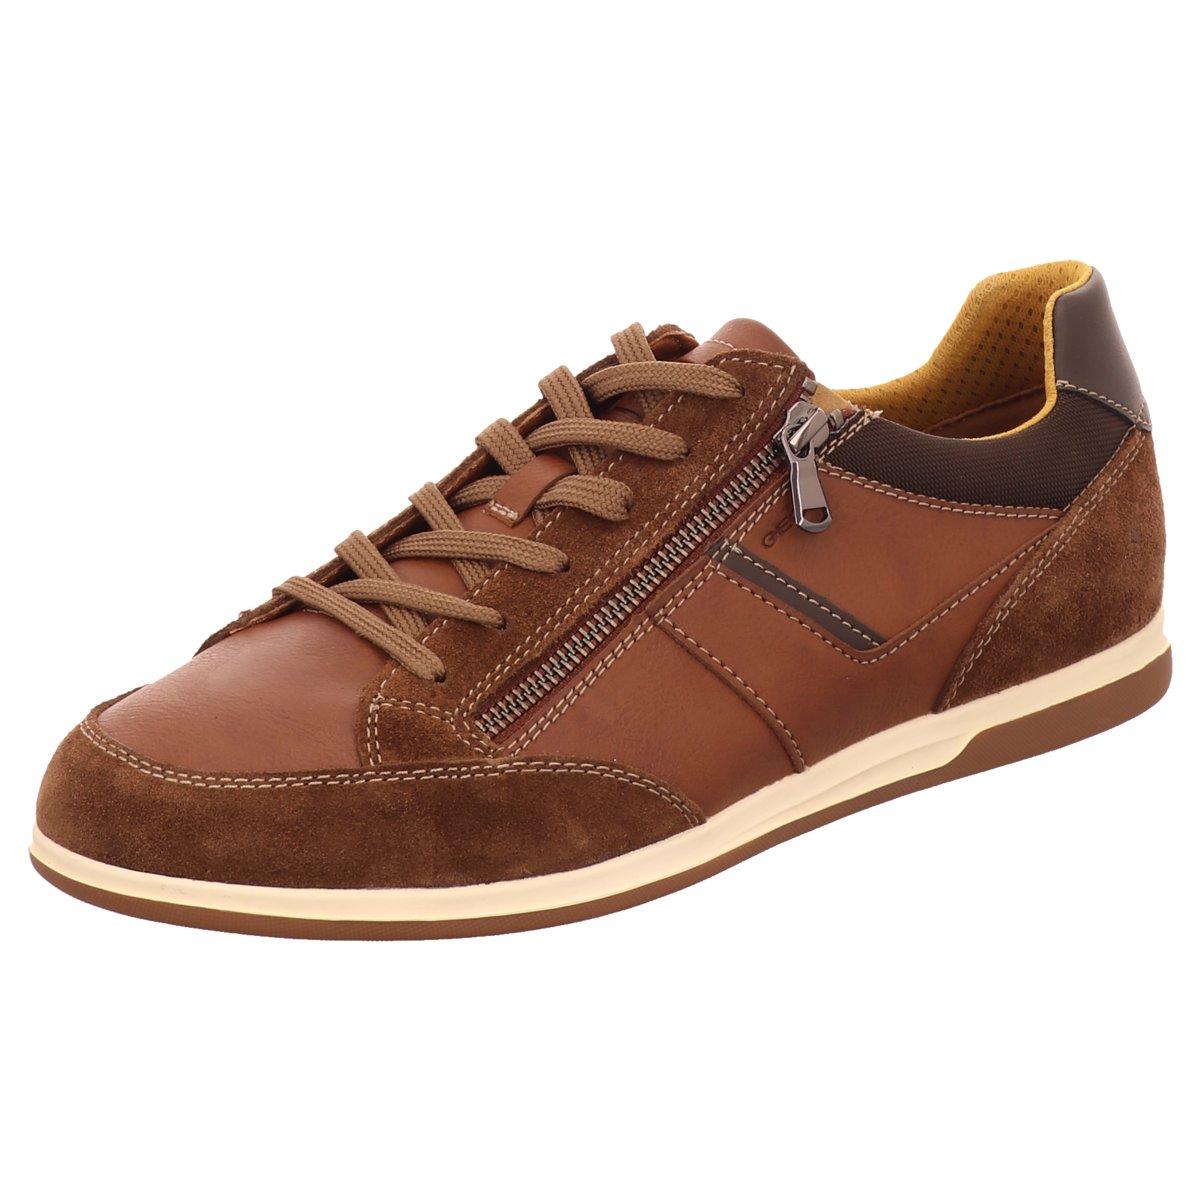 GEOX Herren Sneaker Braun